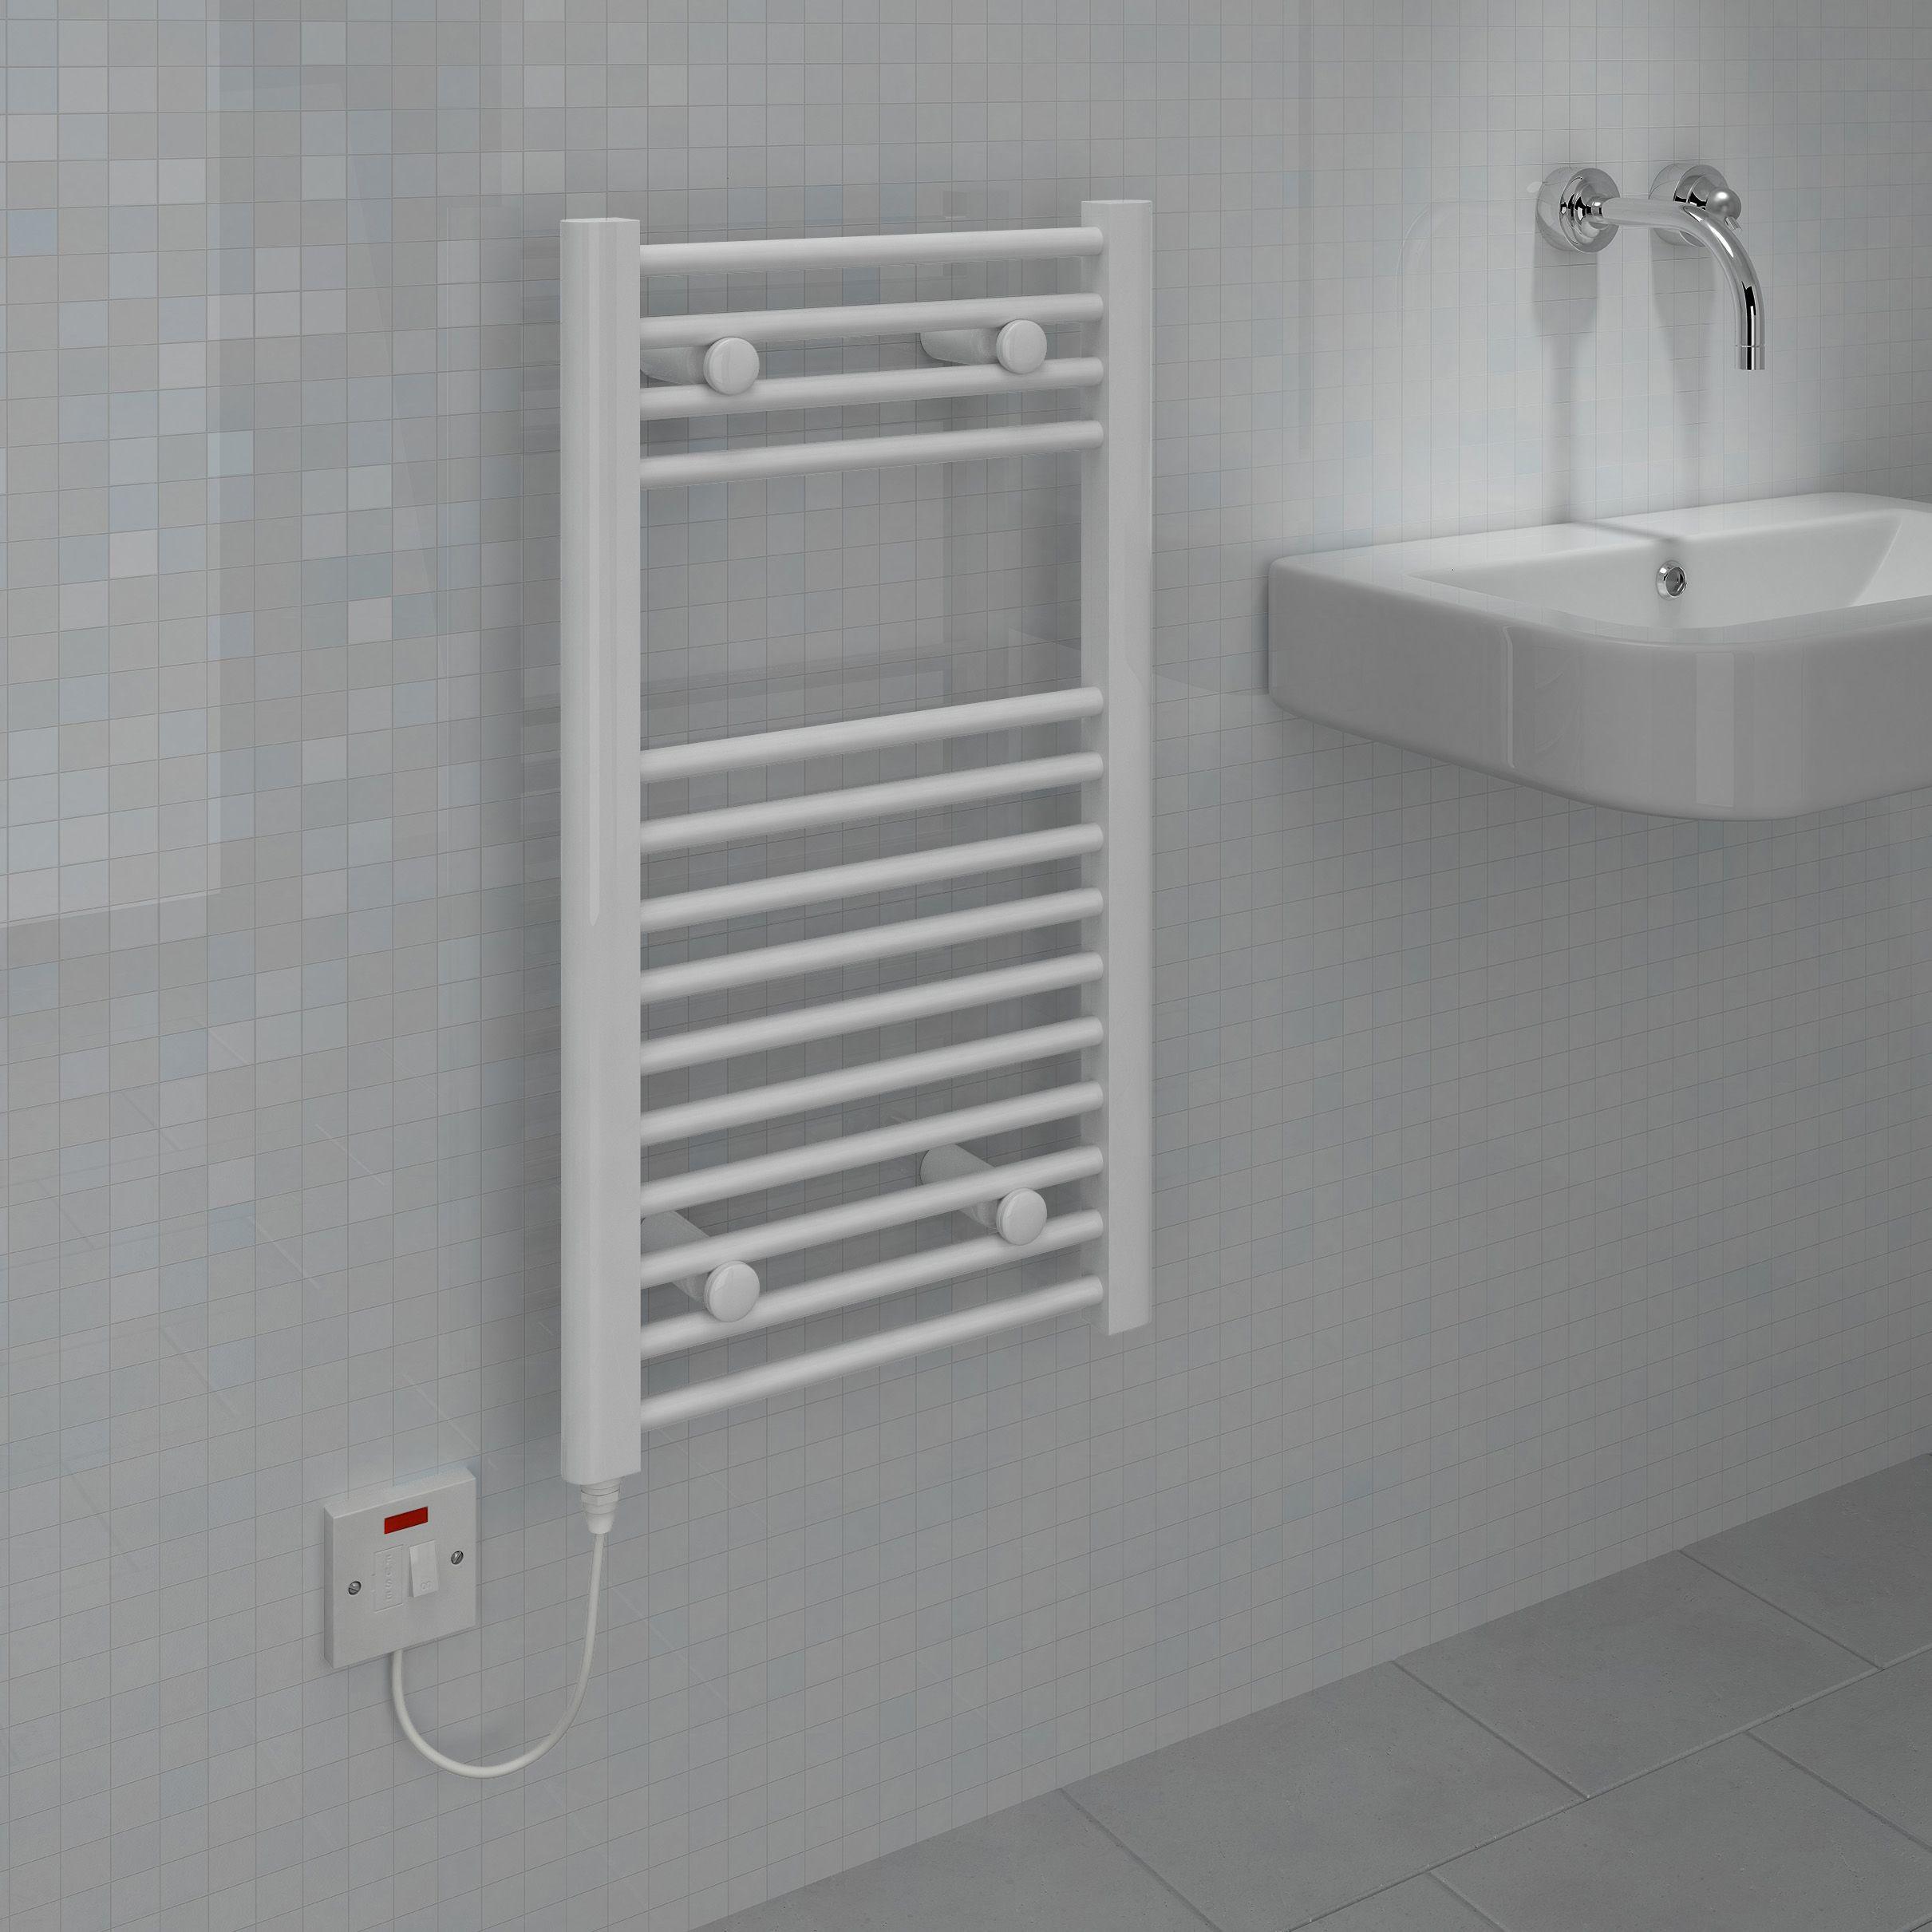 Bathroom towel heater - Bathroom Towel Heater 39